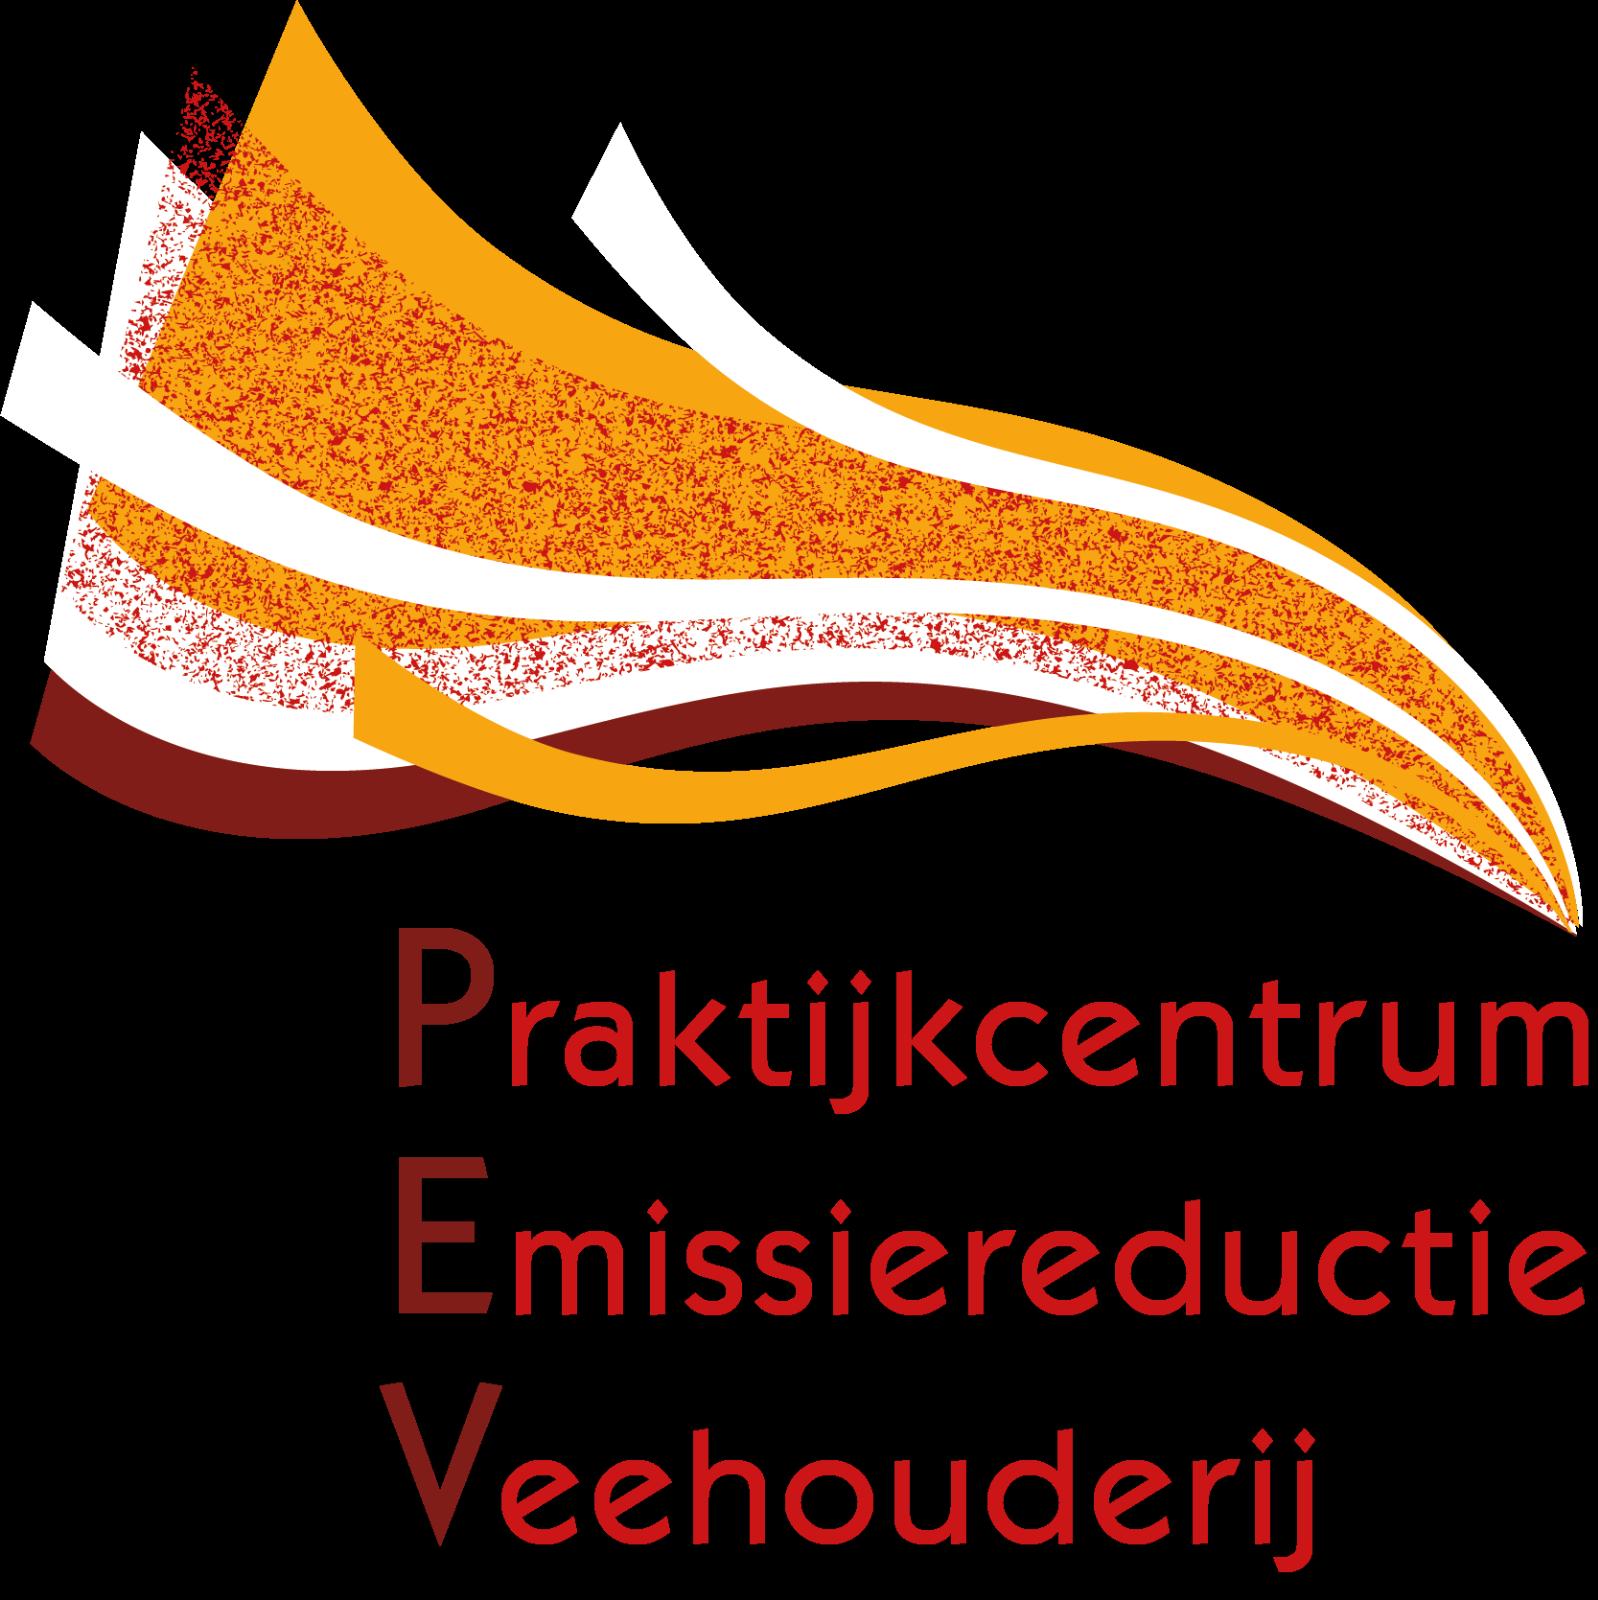 Logo Praktijkcentrum Emissiereductie (PEV) Veehouderij_Fijnstfof Event